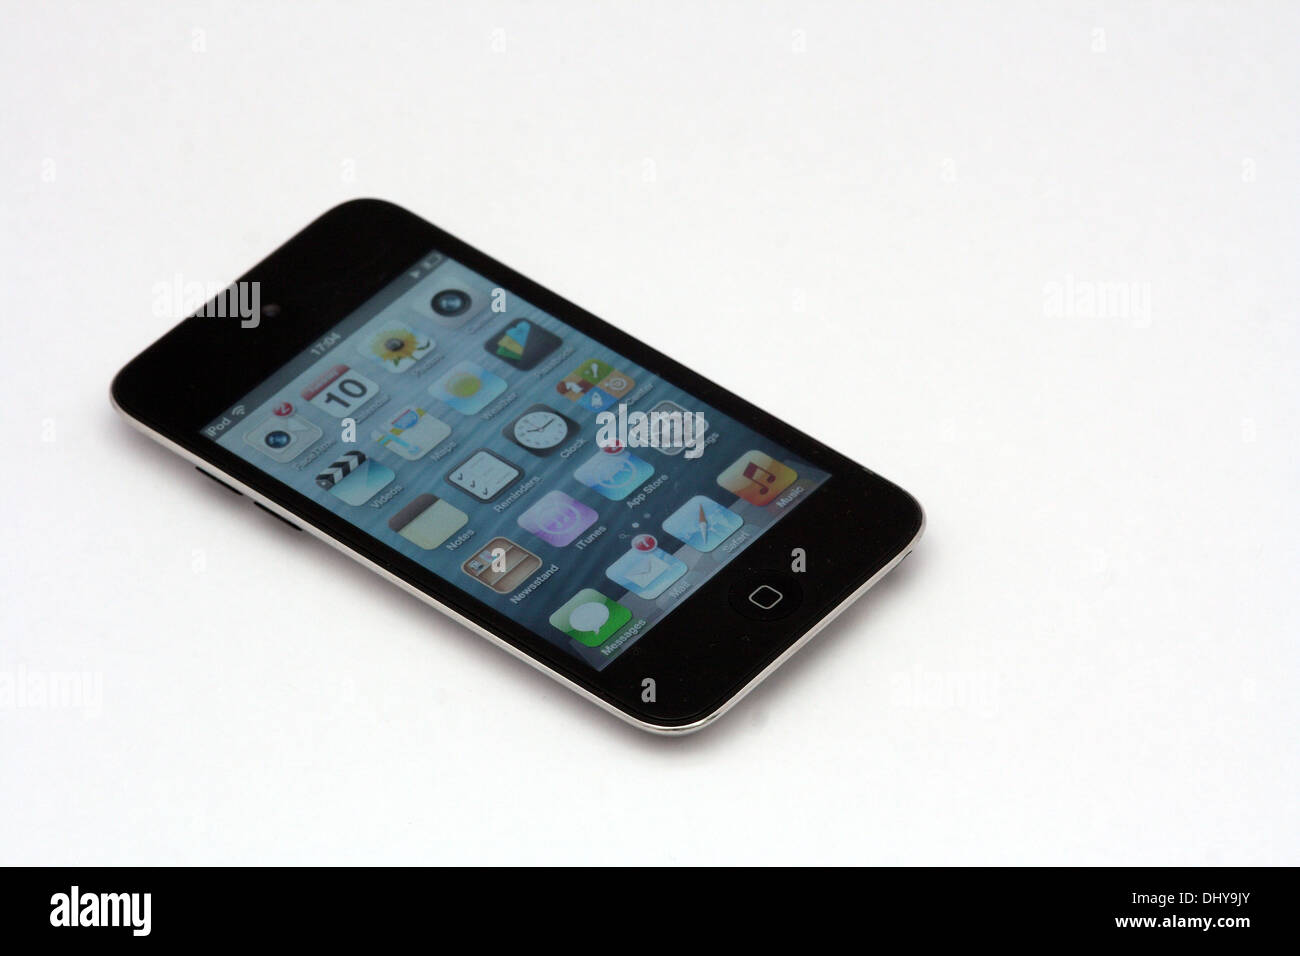 Un ipod touch de 4ª generación Foto & Imagen De Stock: 62680547 - Alamy